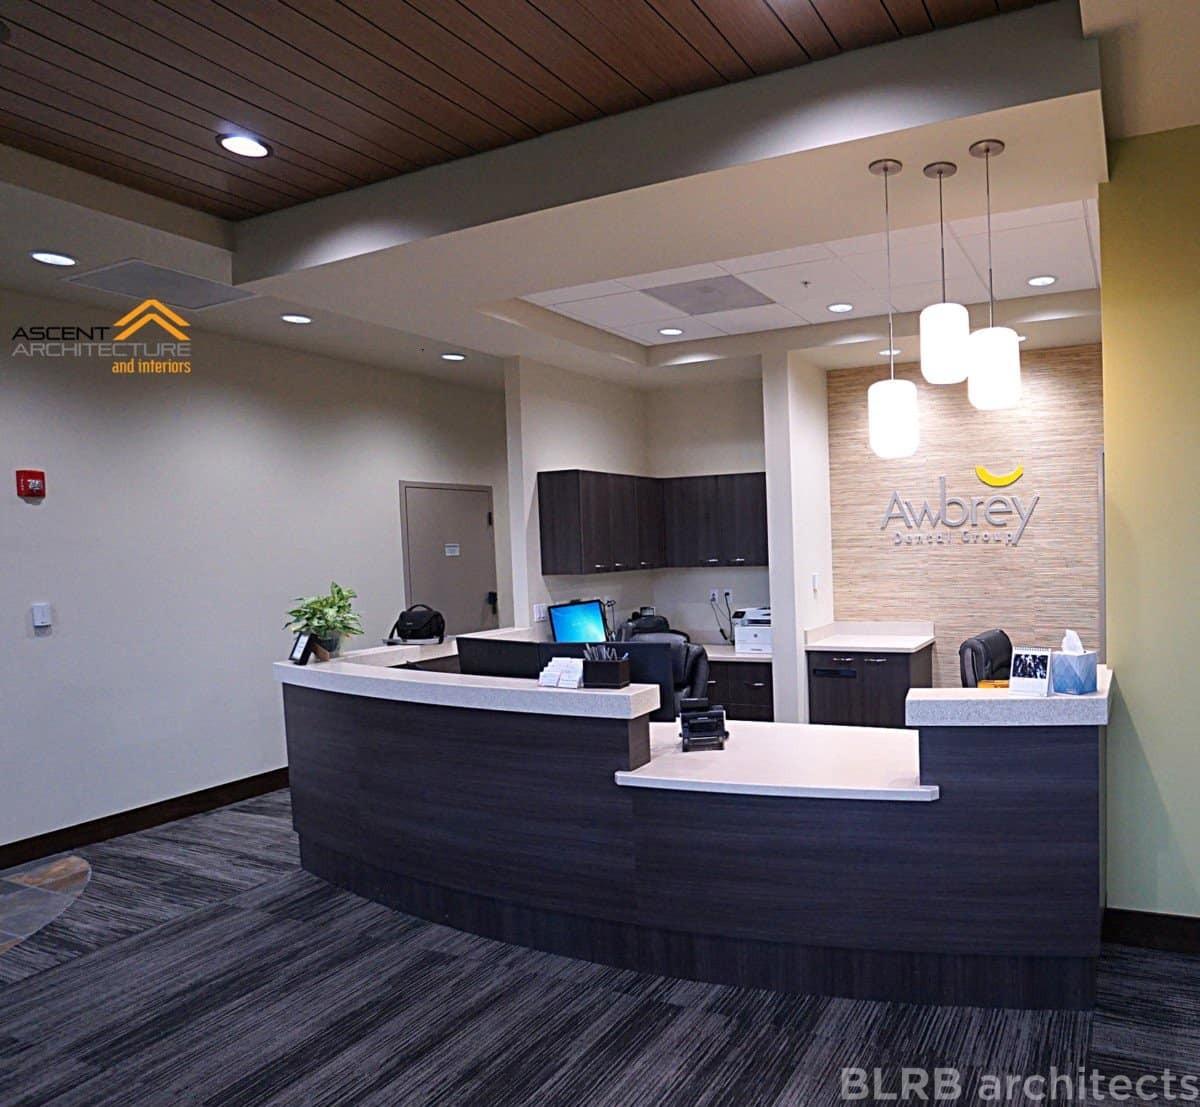 Bend Oregon Apartments: Awbrey Dental > Ascent Architecture & Interiors, Bend